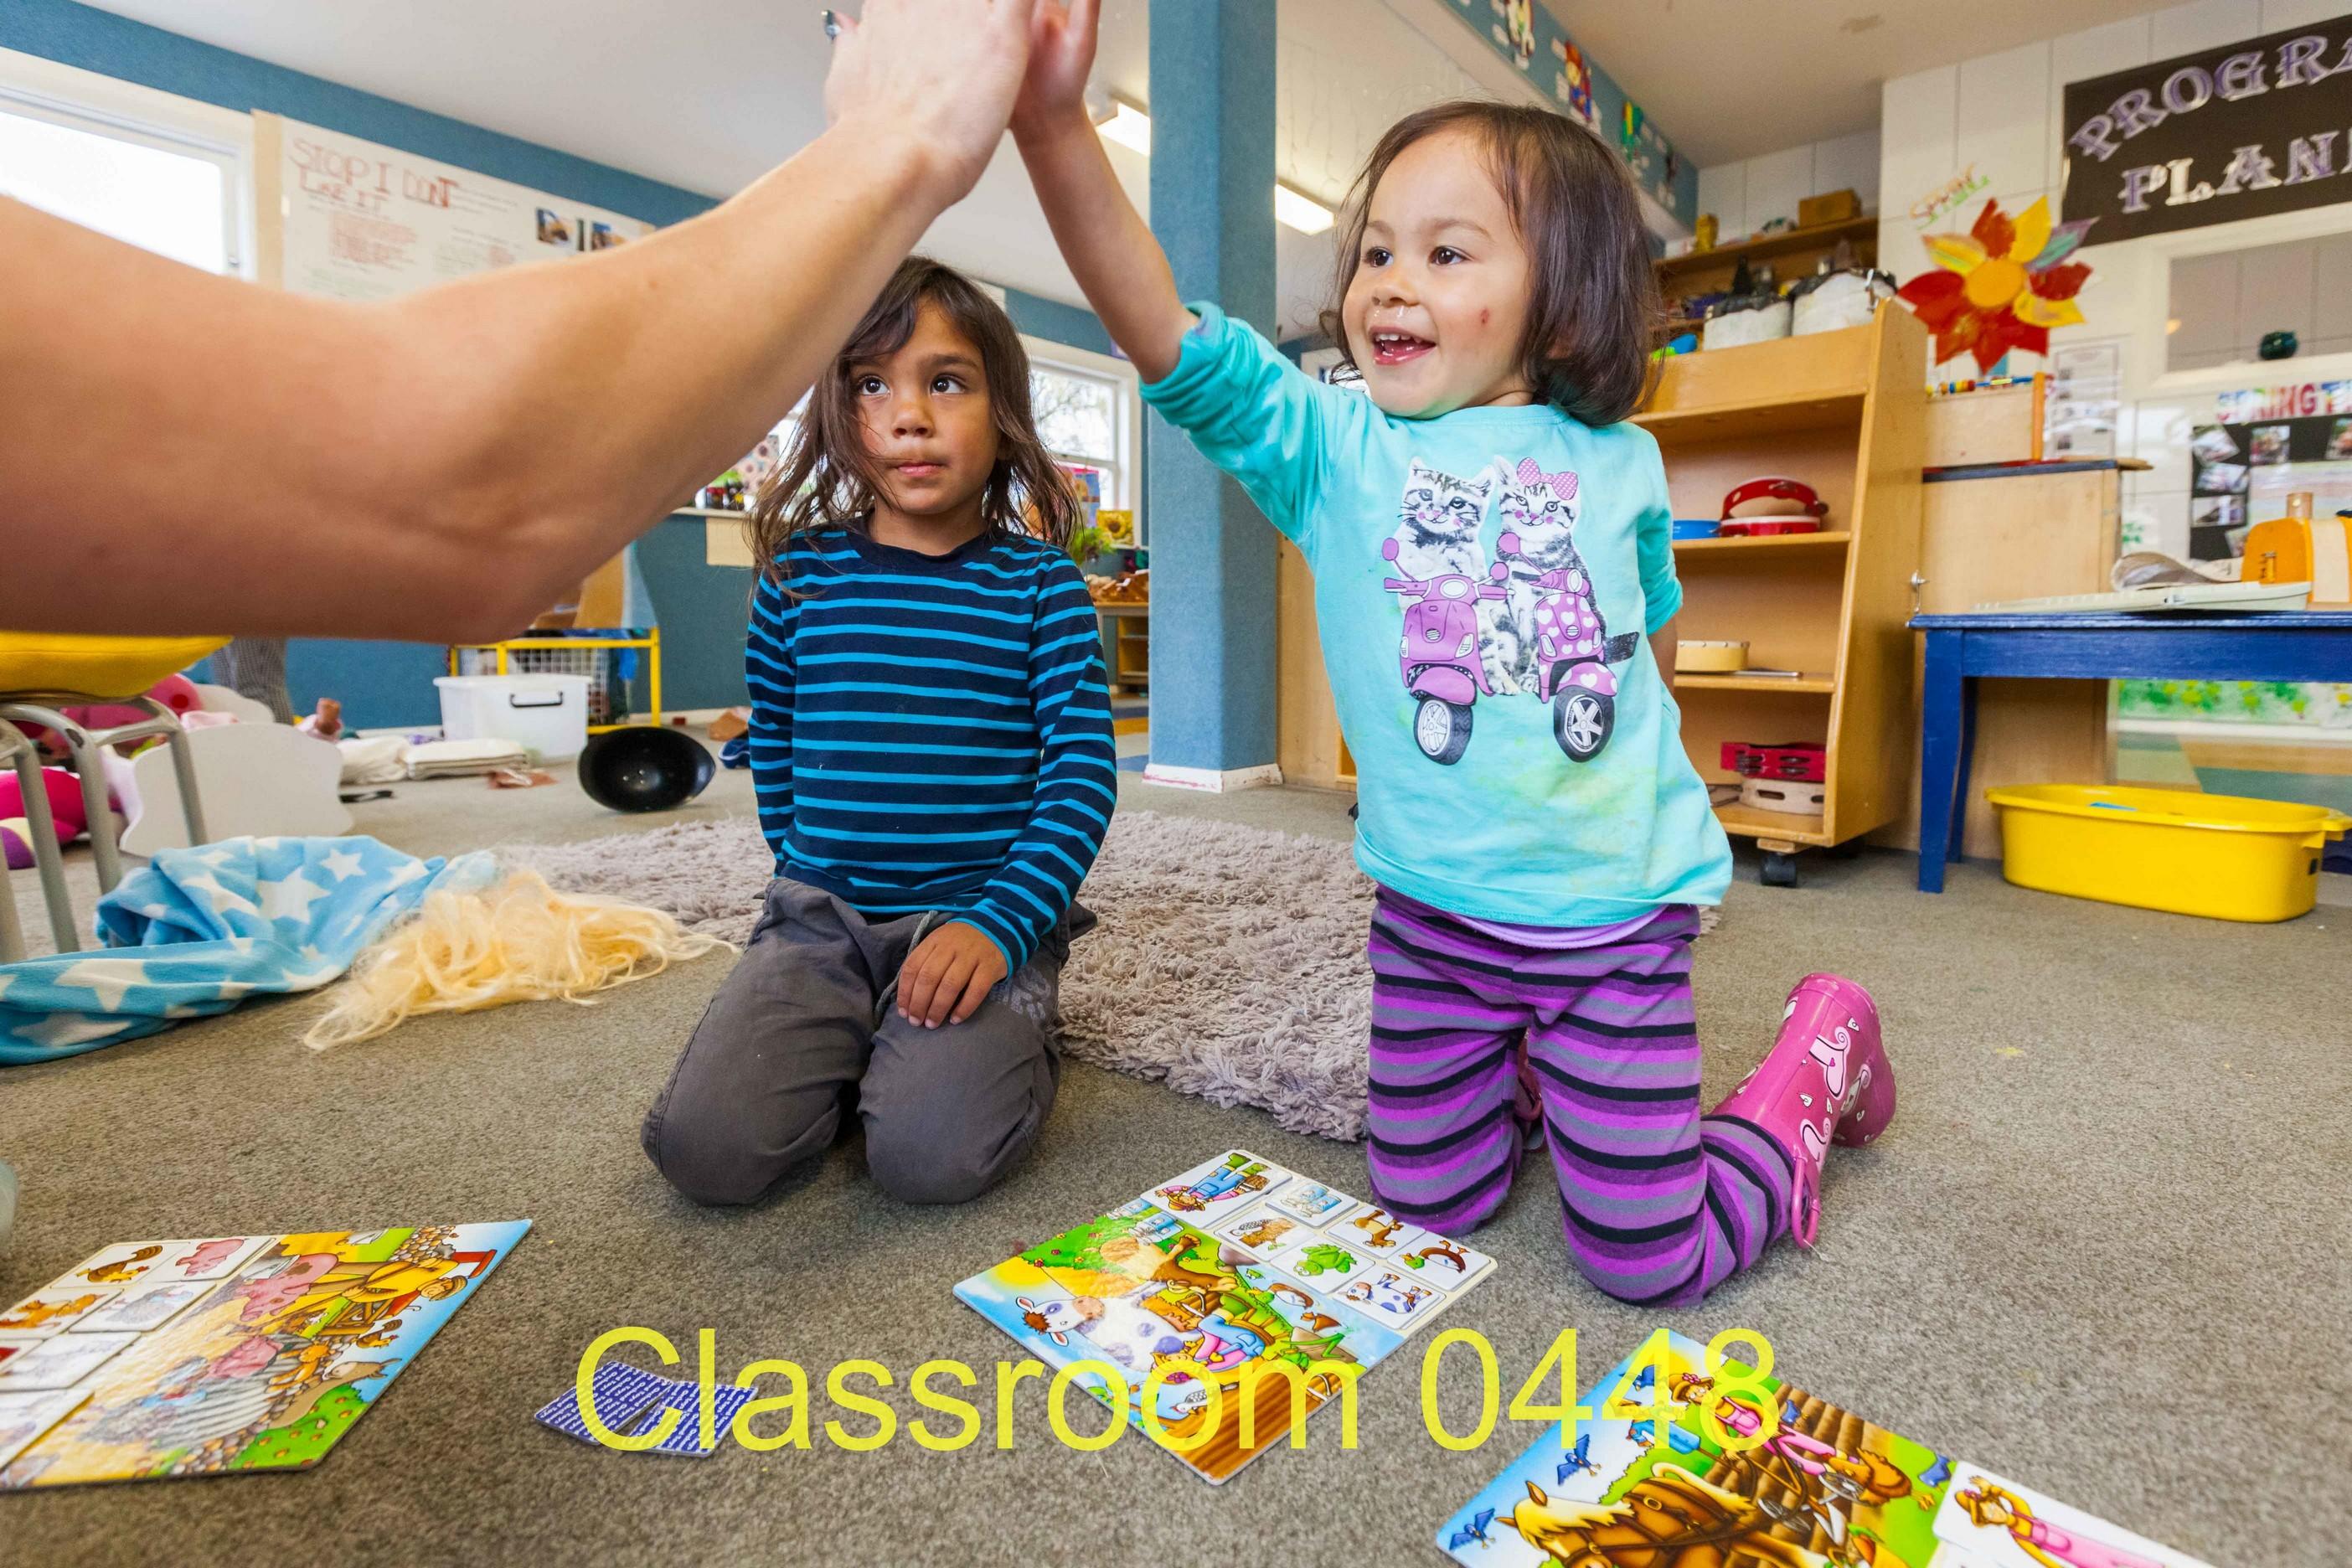 Classroom 0448